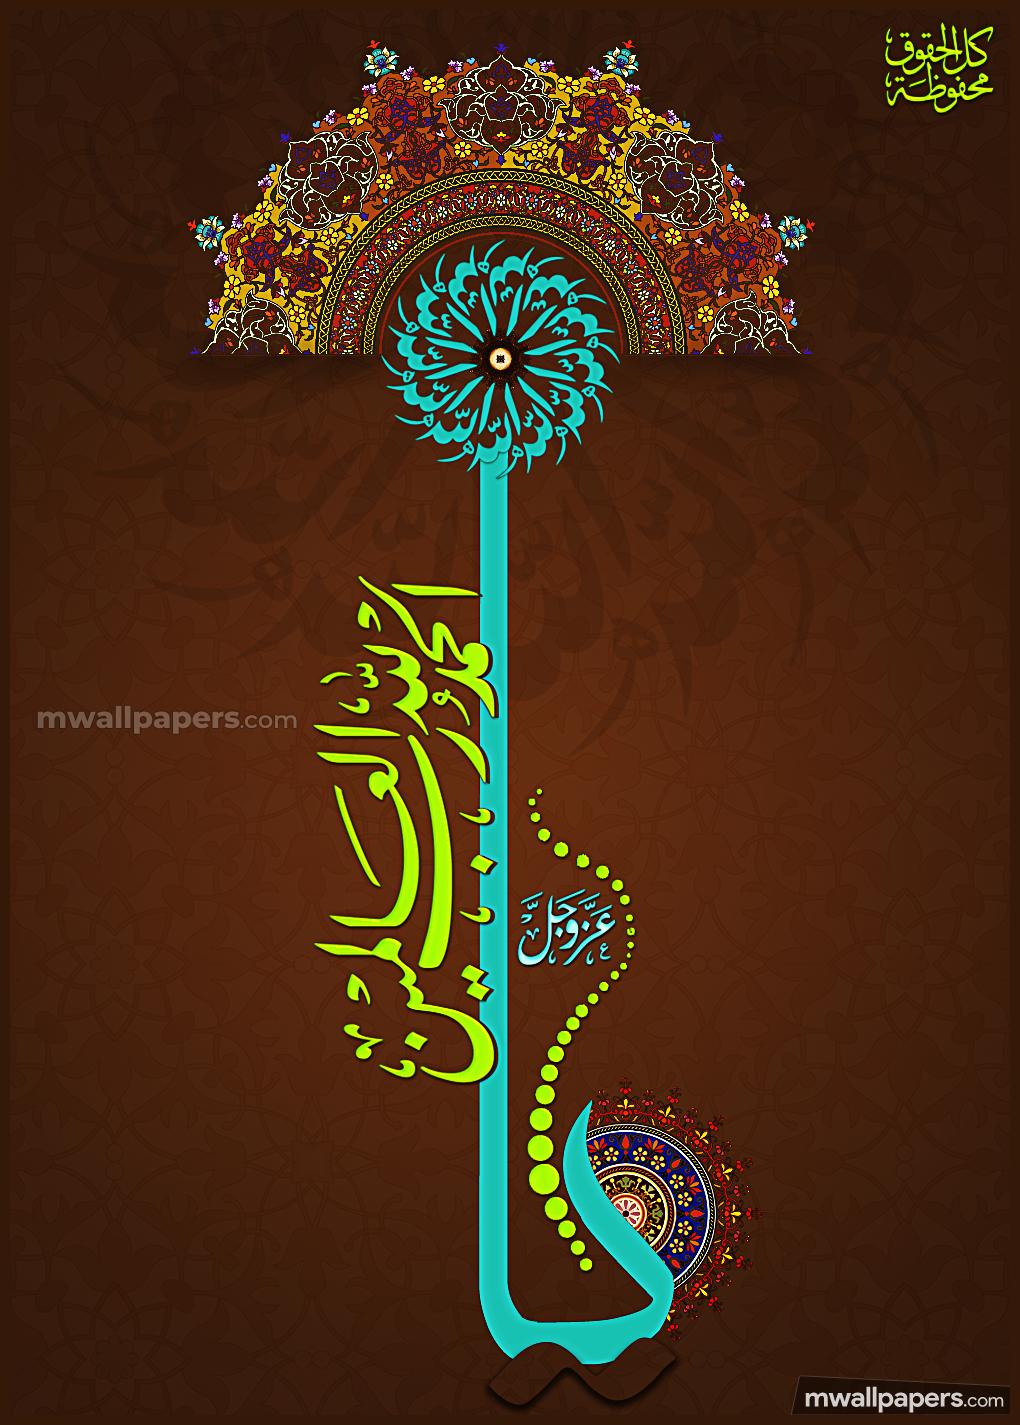 Gambar List Of Mewarnai Lafadz Allah Pict Best Pictures Jpeg Png Gif